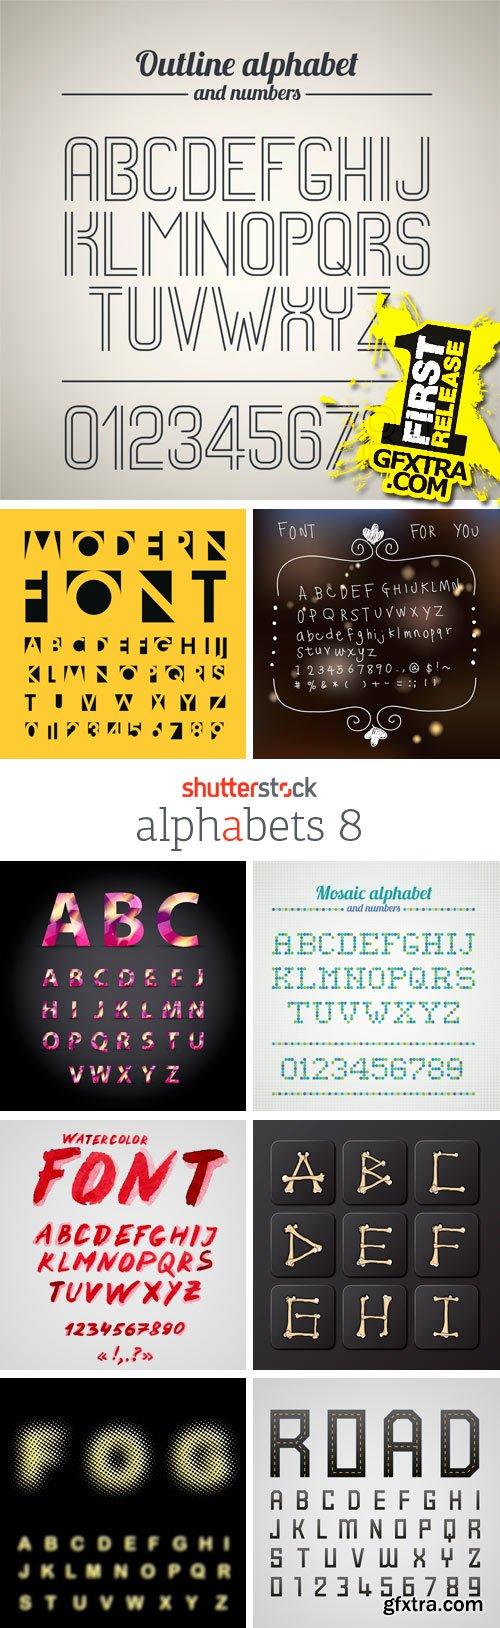 Amazing SS - Alphabets 8, 25xEPS